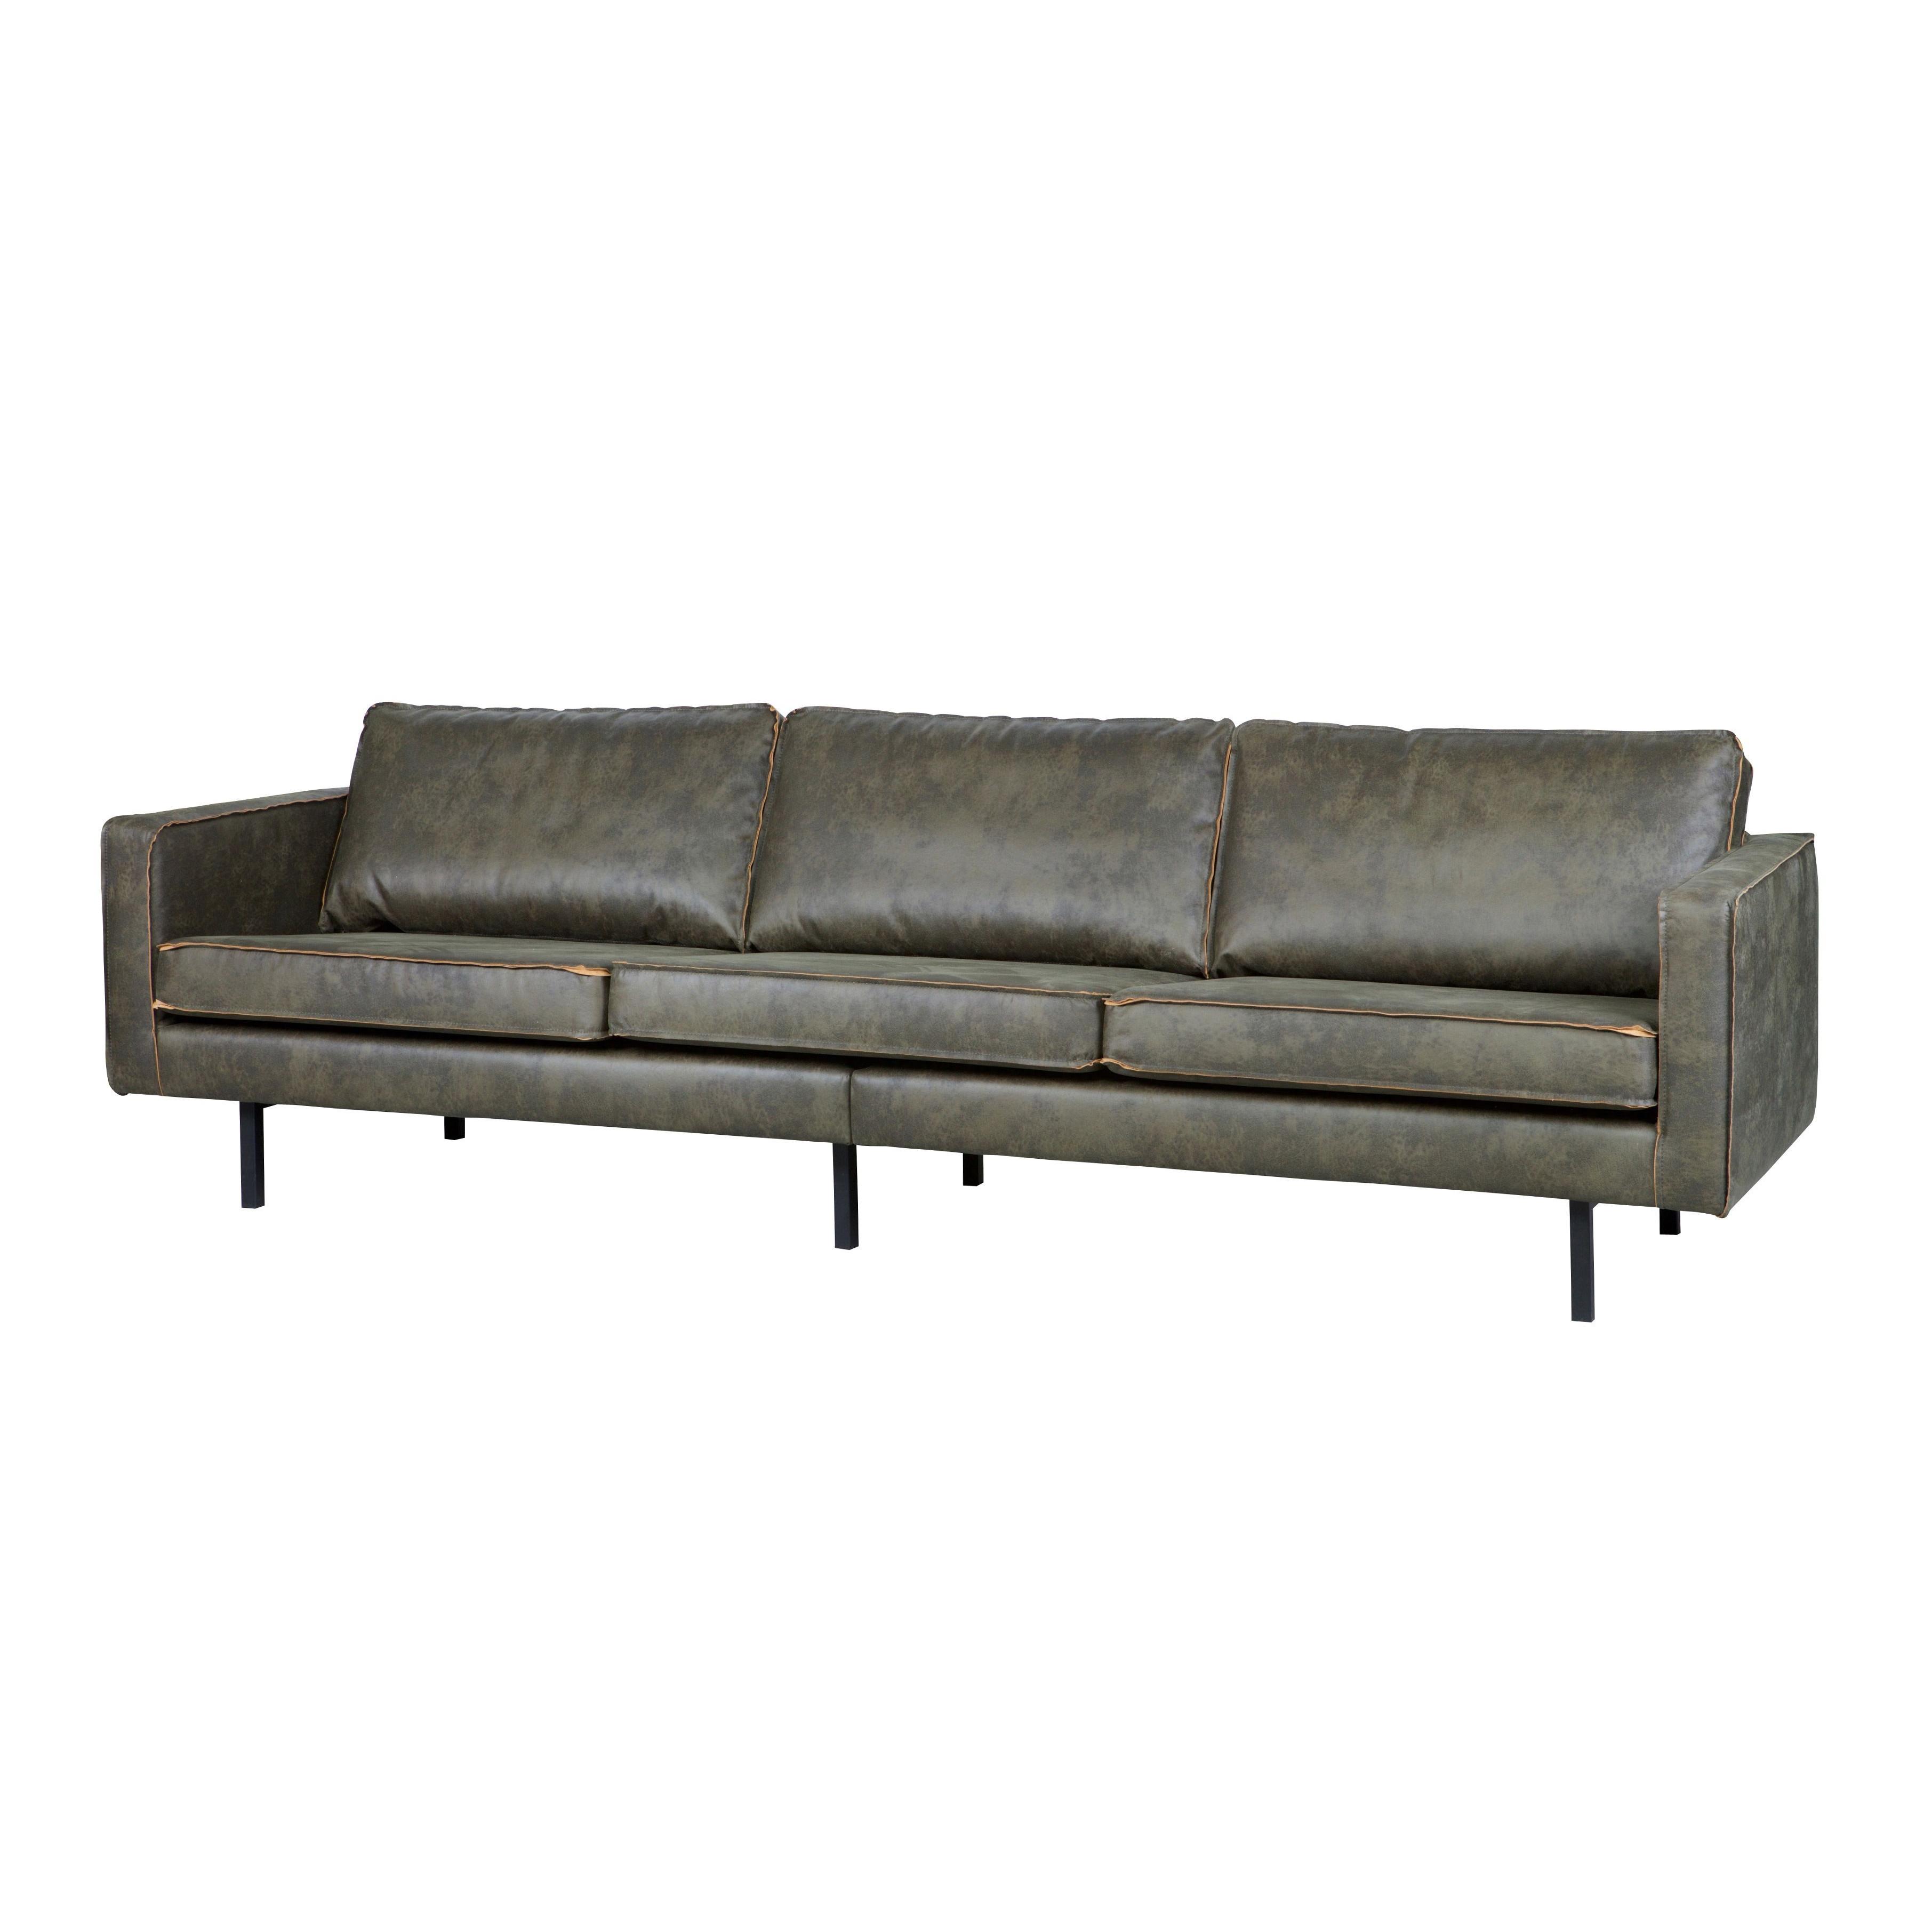 3-Sitzer-Sofa Rodeo | Grün